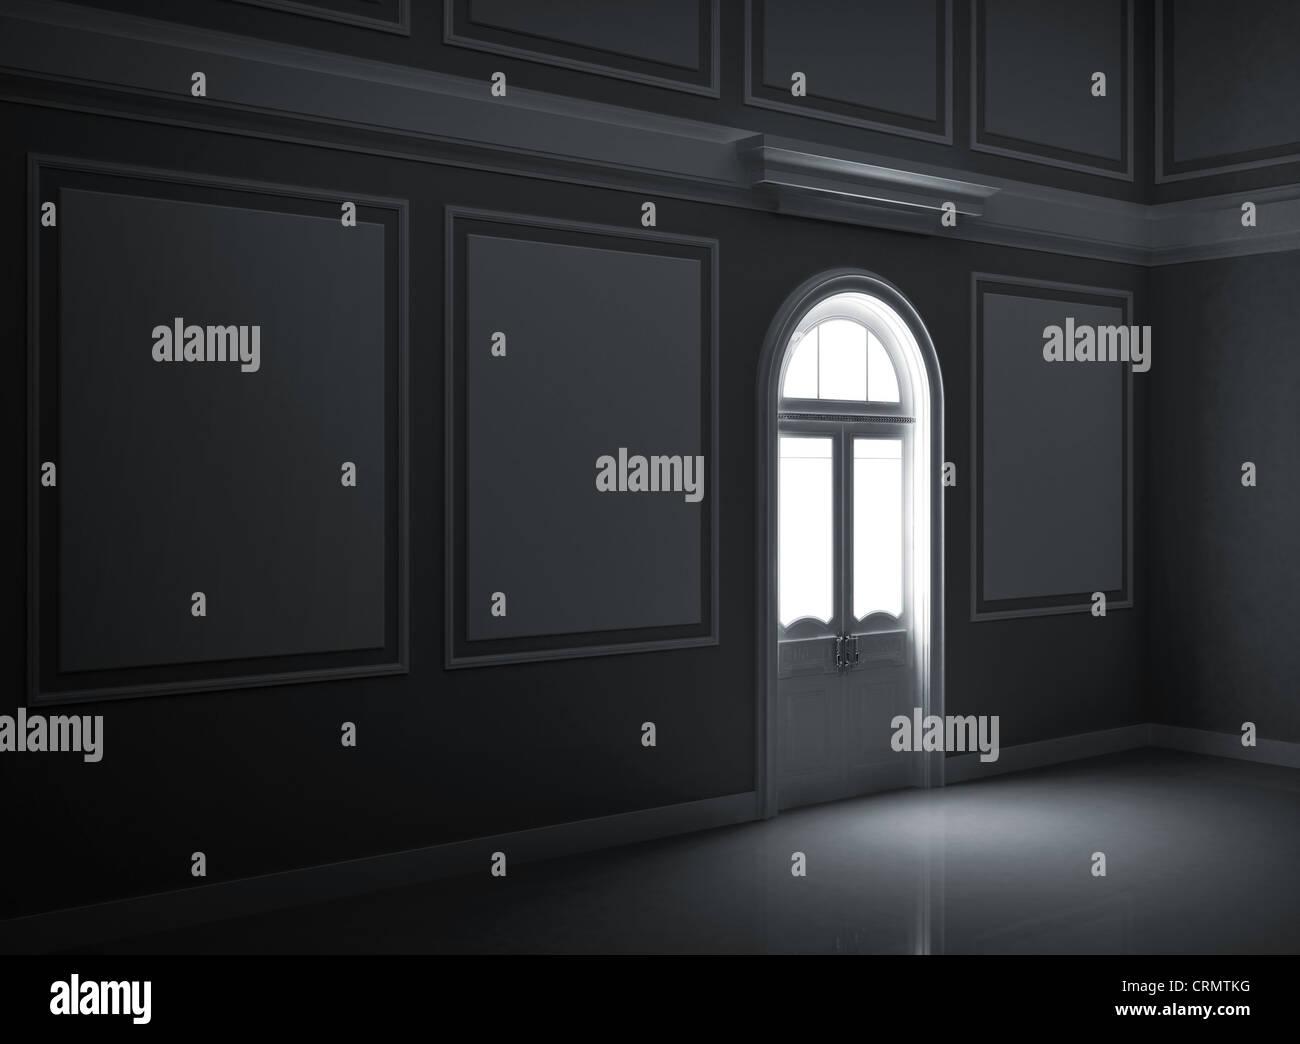 Abstract Dark Night Palace Empty Room Interior With Illuminated Door